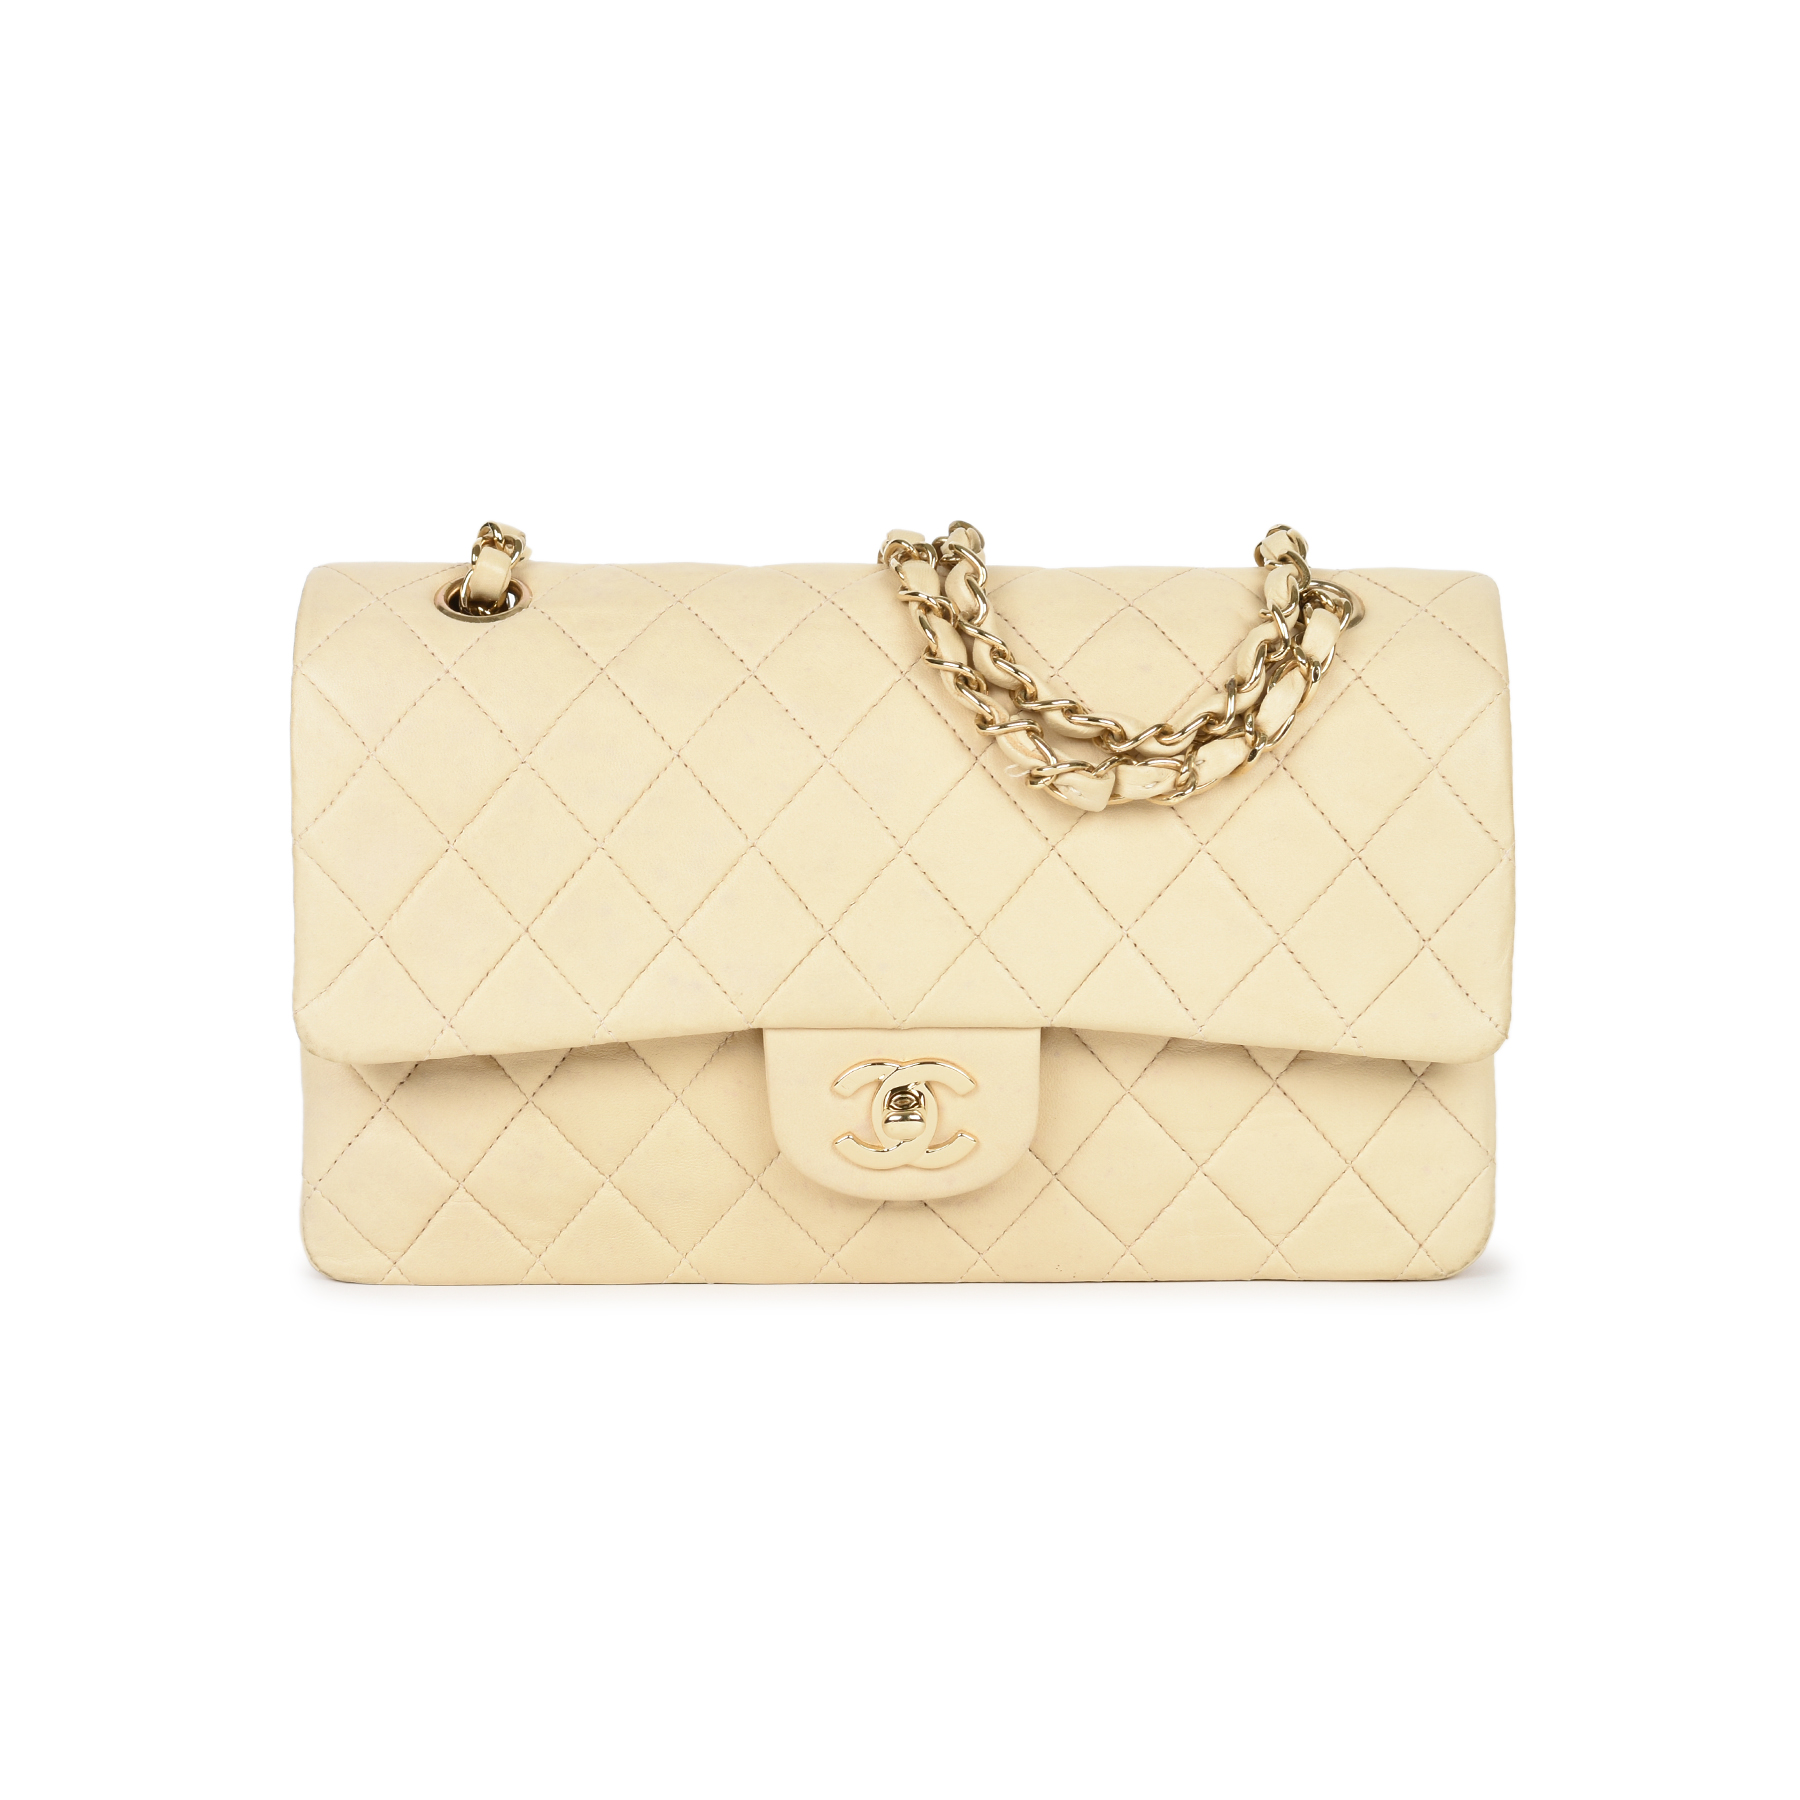 45507f5a5e0f Authentic Second Hand Chanel Cream Medium Classic Flap Bag (PSS-051-00381)